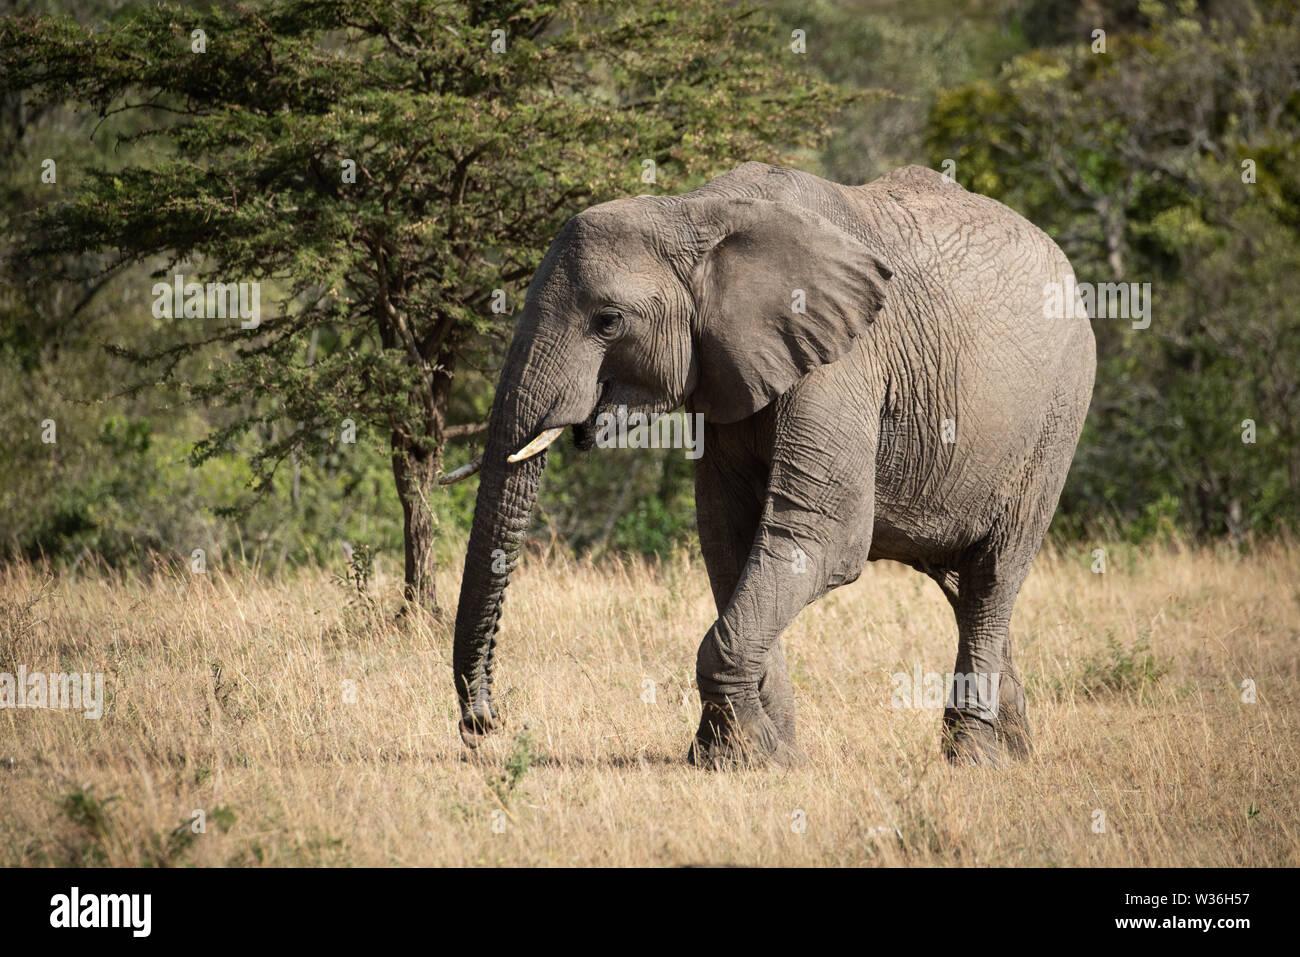 African elephant lifts foot walking across grass - Stock Image